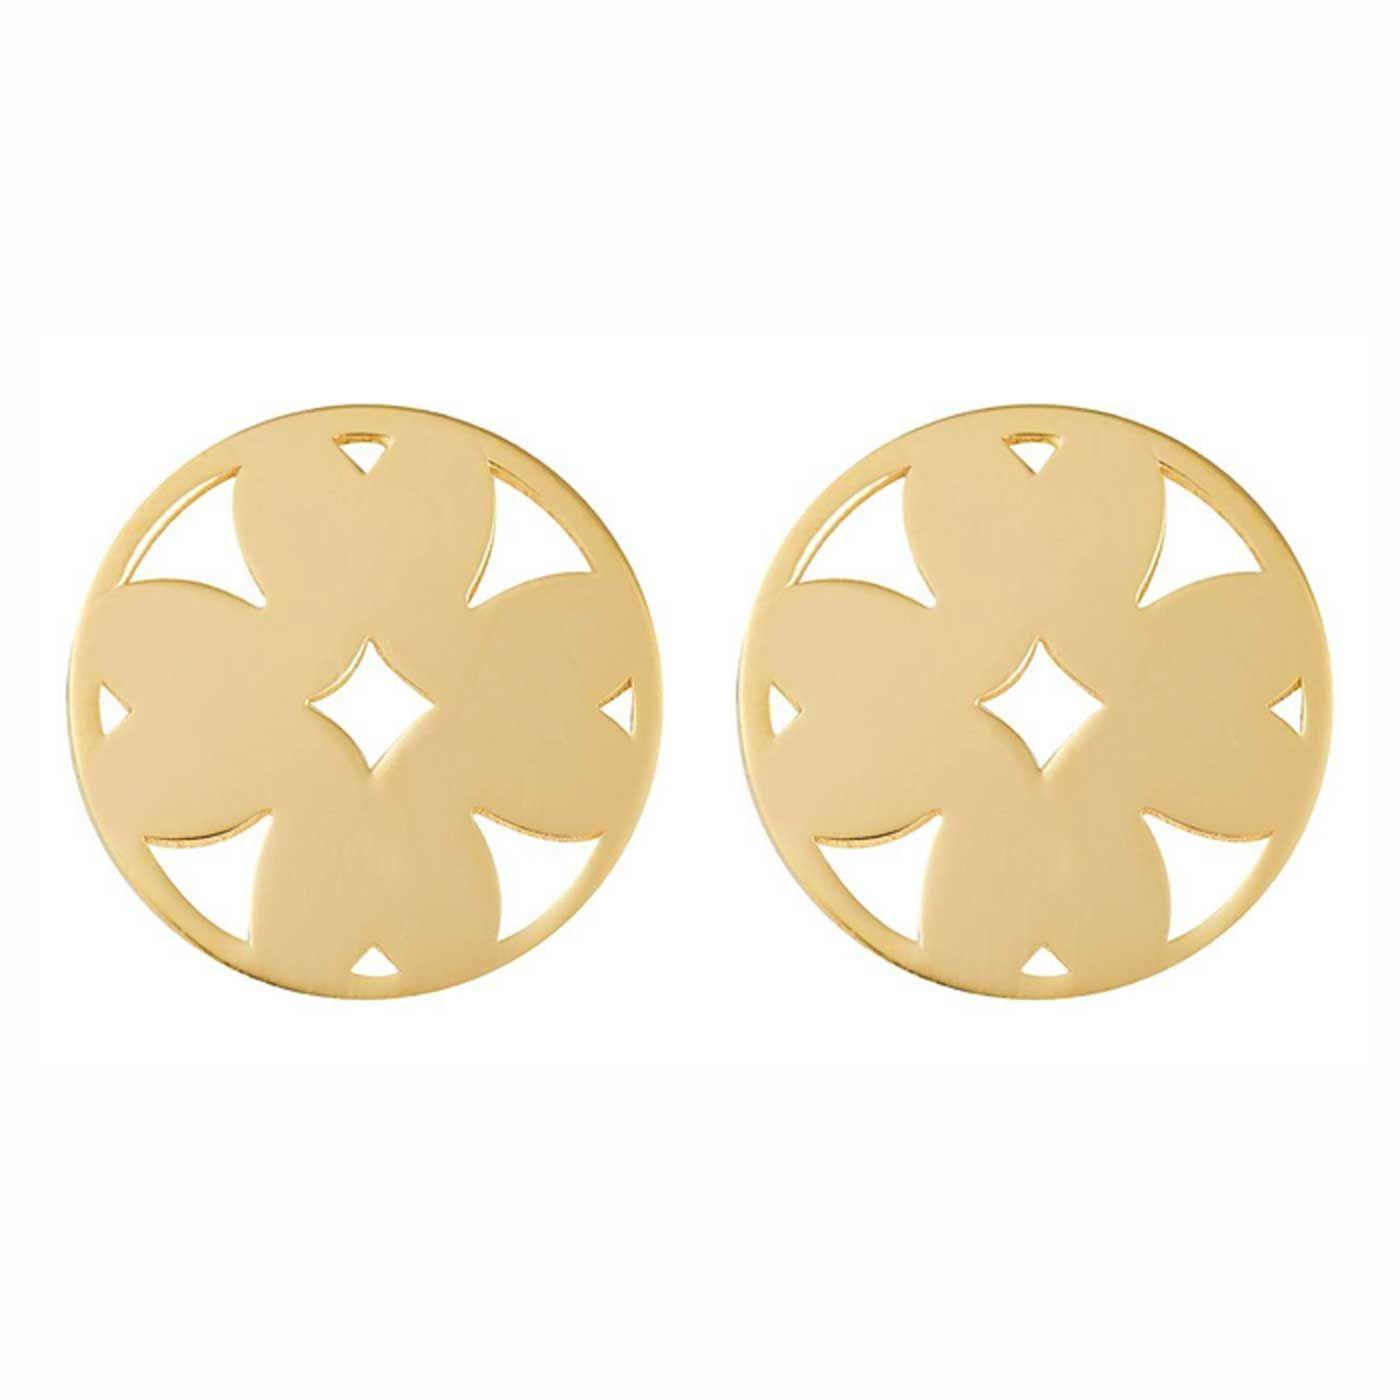 گوشواره طلا 18 عیار زنانه کانیار گالری کد GOA114 -  - 3